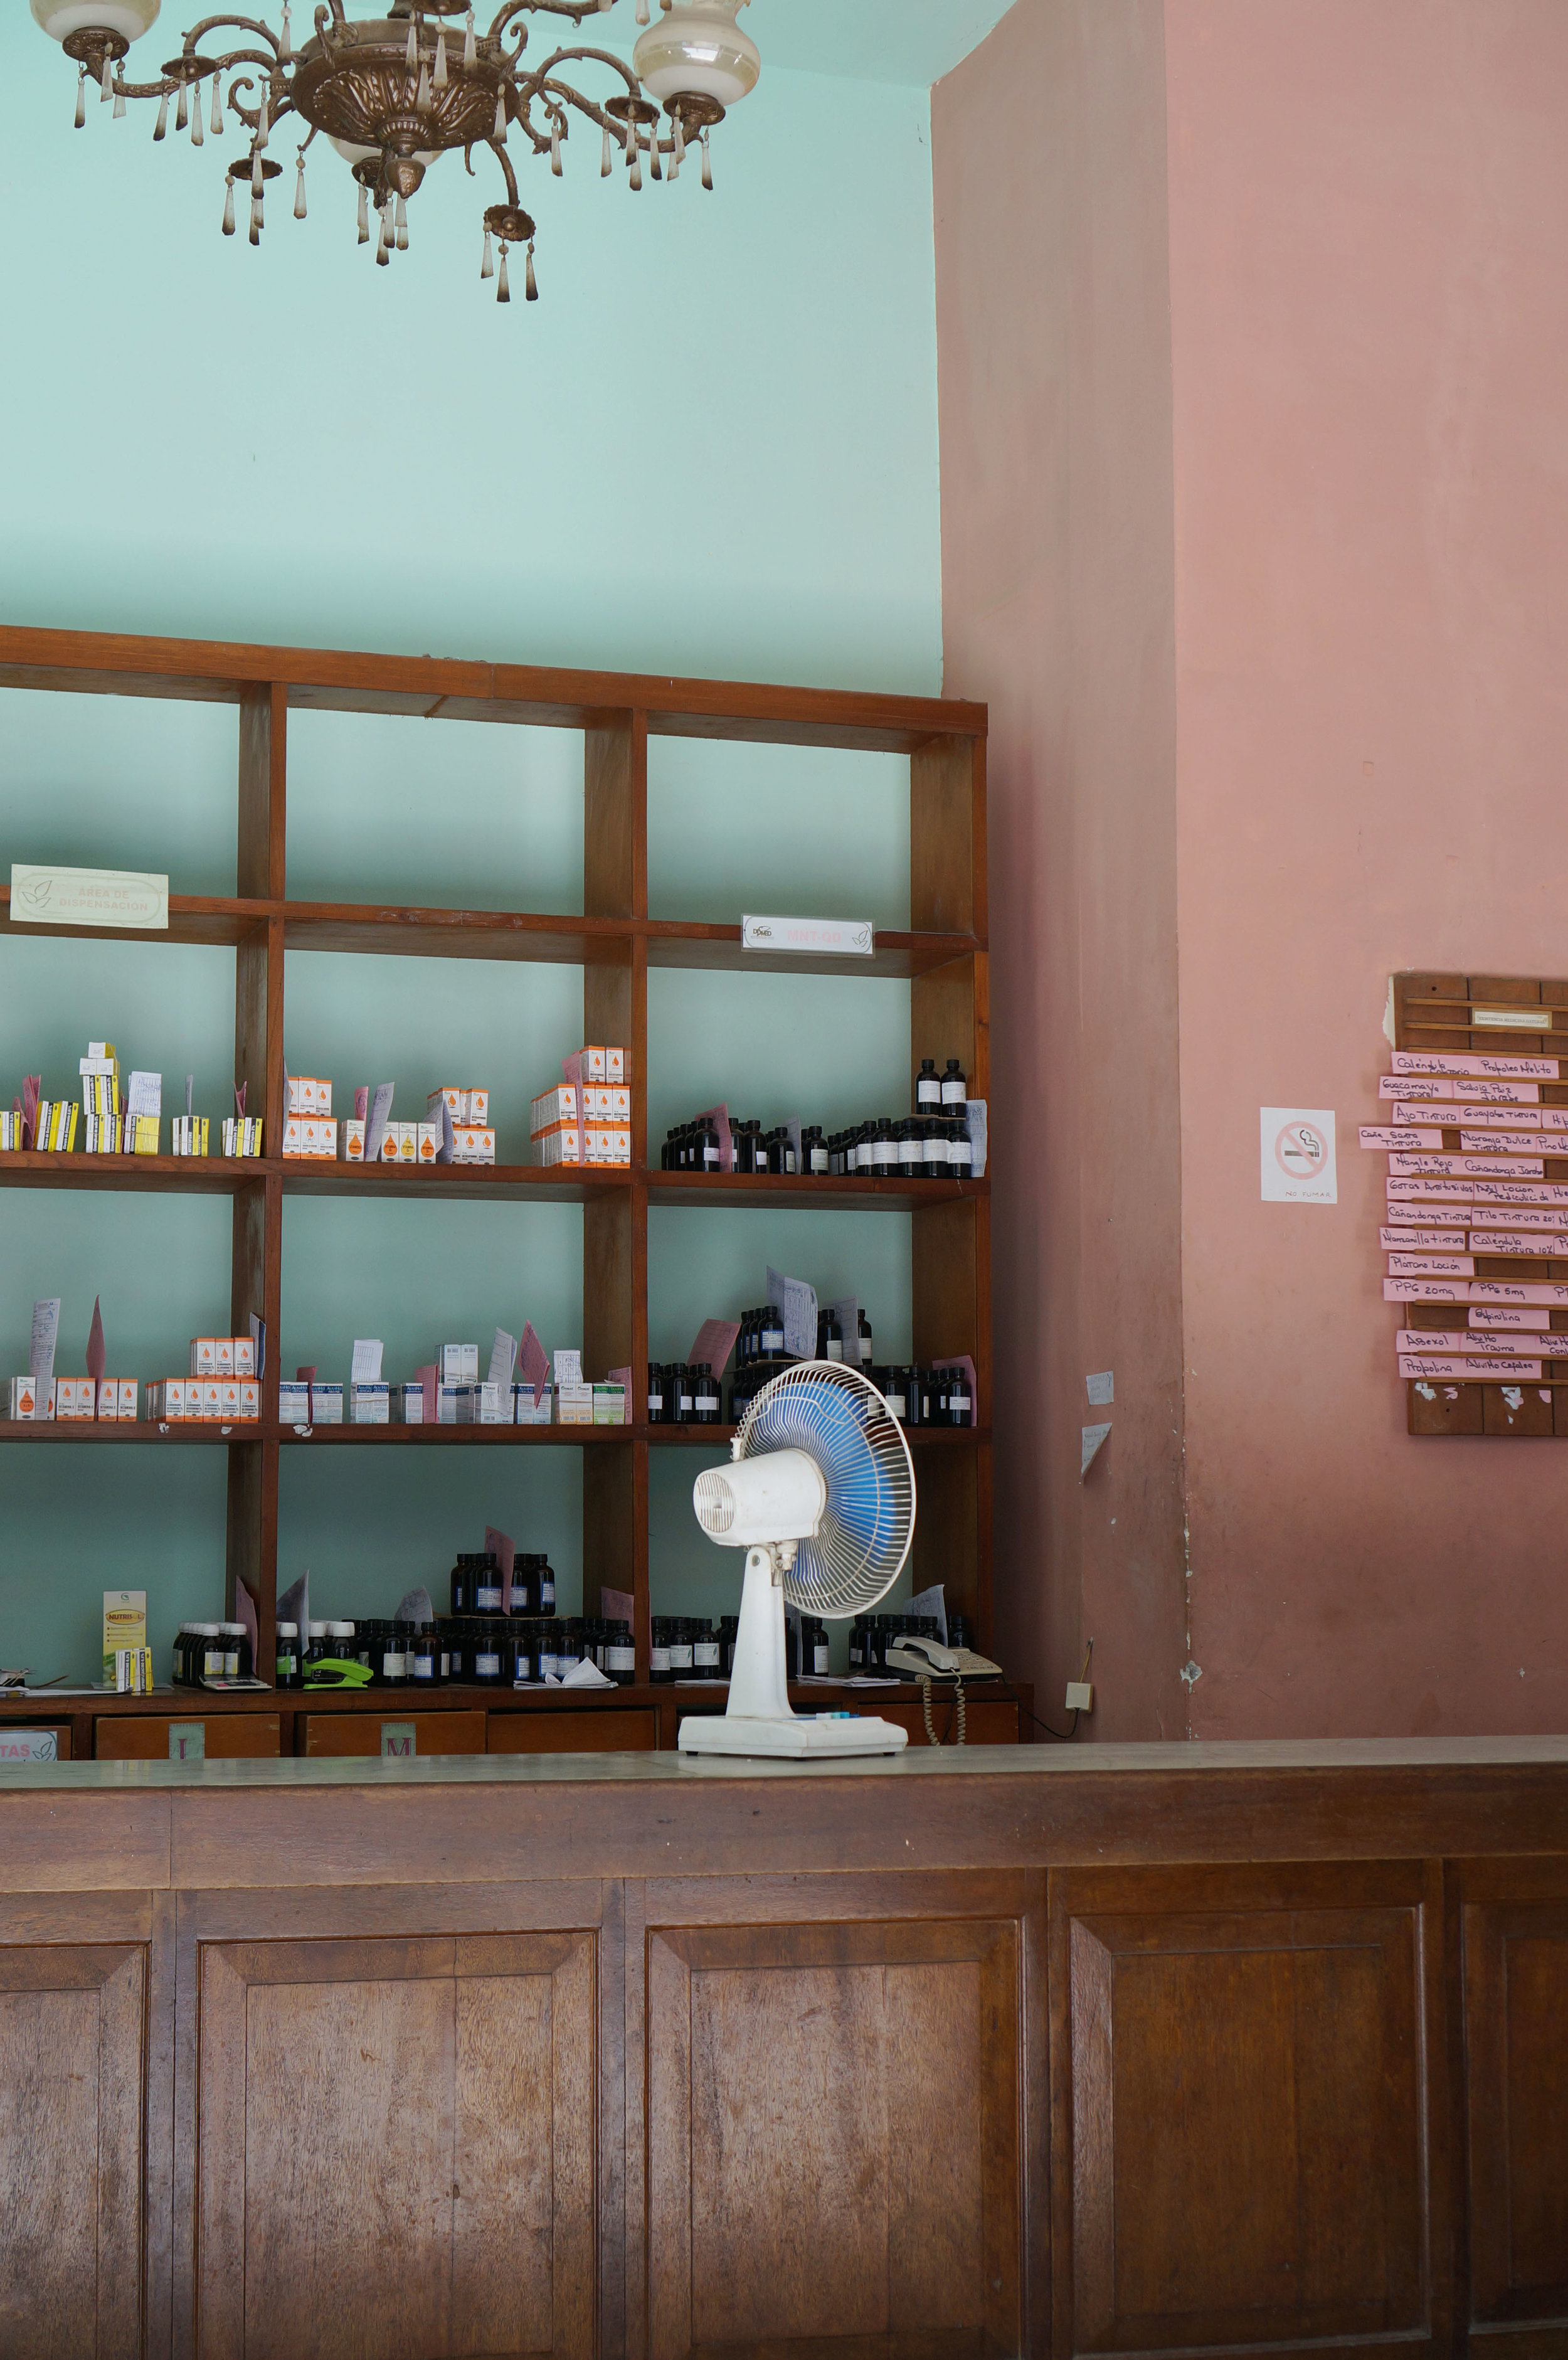 ...actual operating pharmacy.